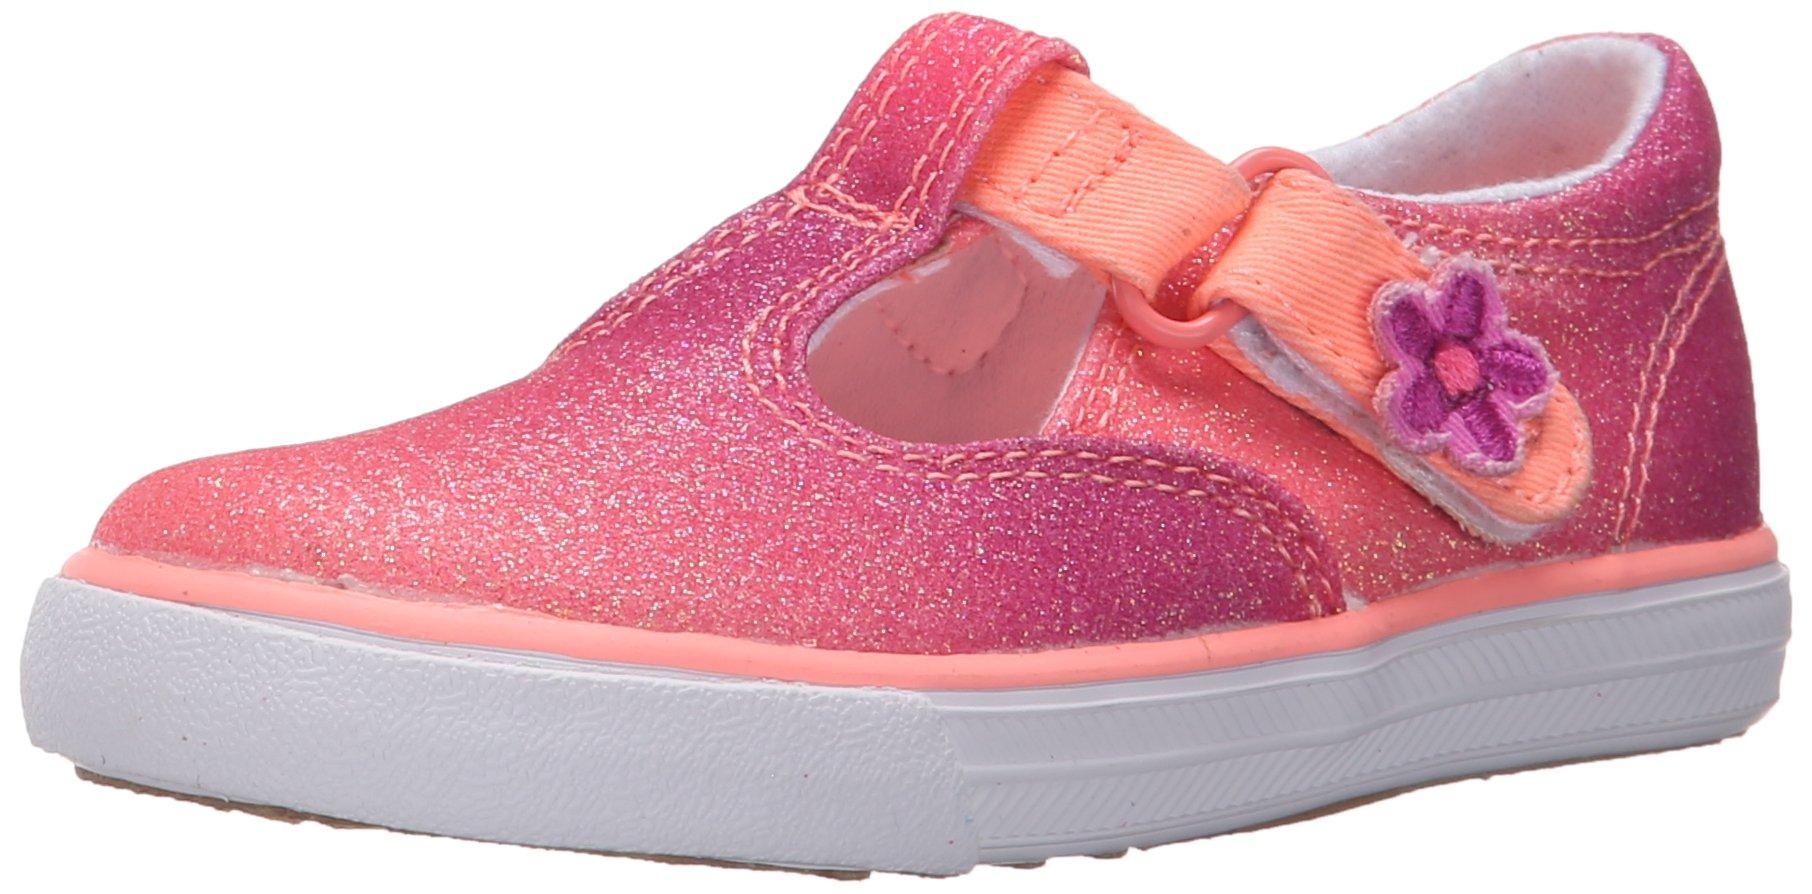 Keds Daphne T-Strap Sneaker (Toddler/Little Kid), Coral Fade Sugar Dip, 5.5 M US Toddler